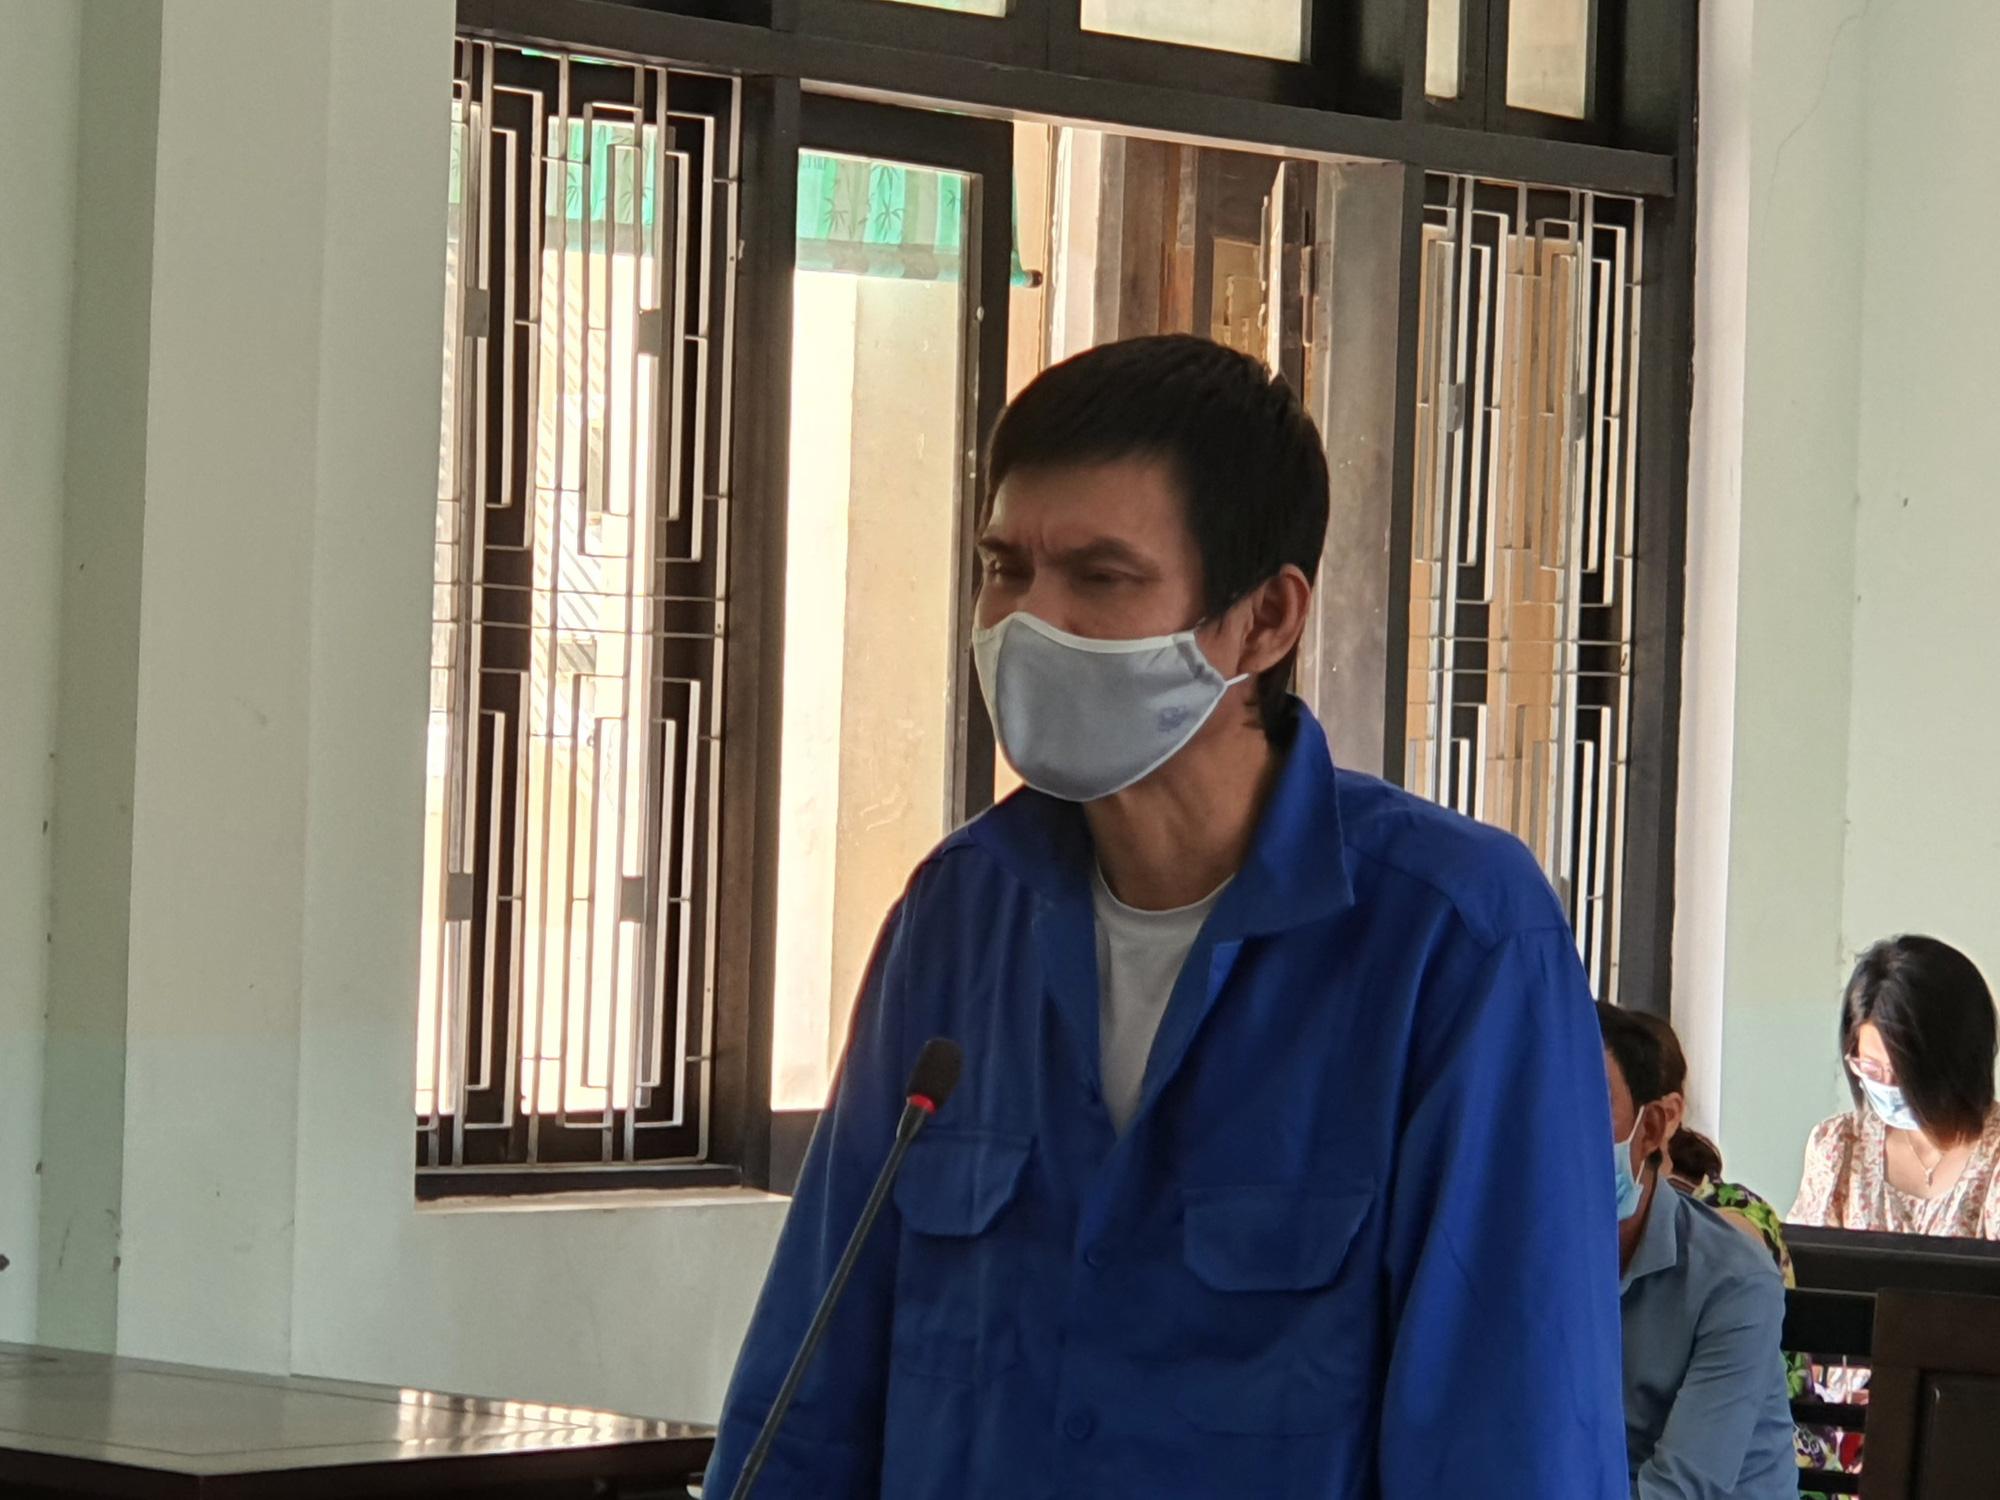 Vietnamese man sentenced to life behind bars for transporting 30,000 drug pills